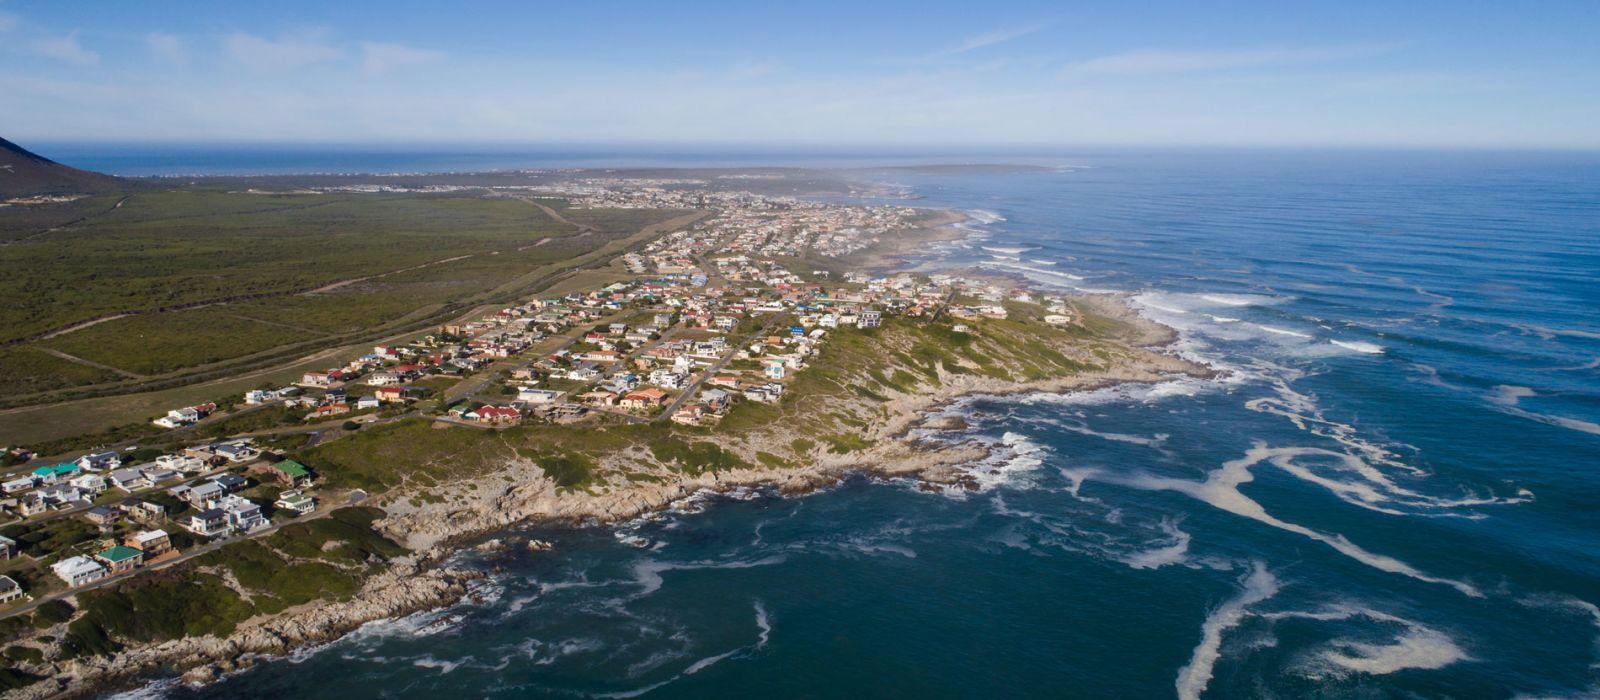 Destination Gansbaai South Africa